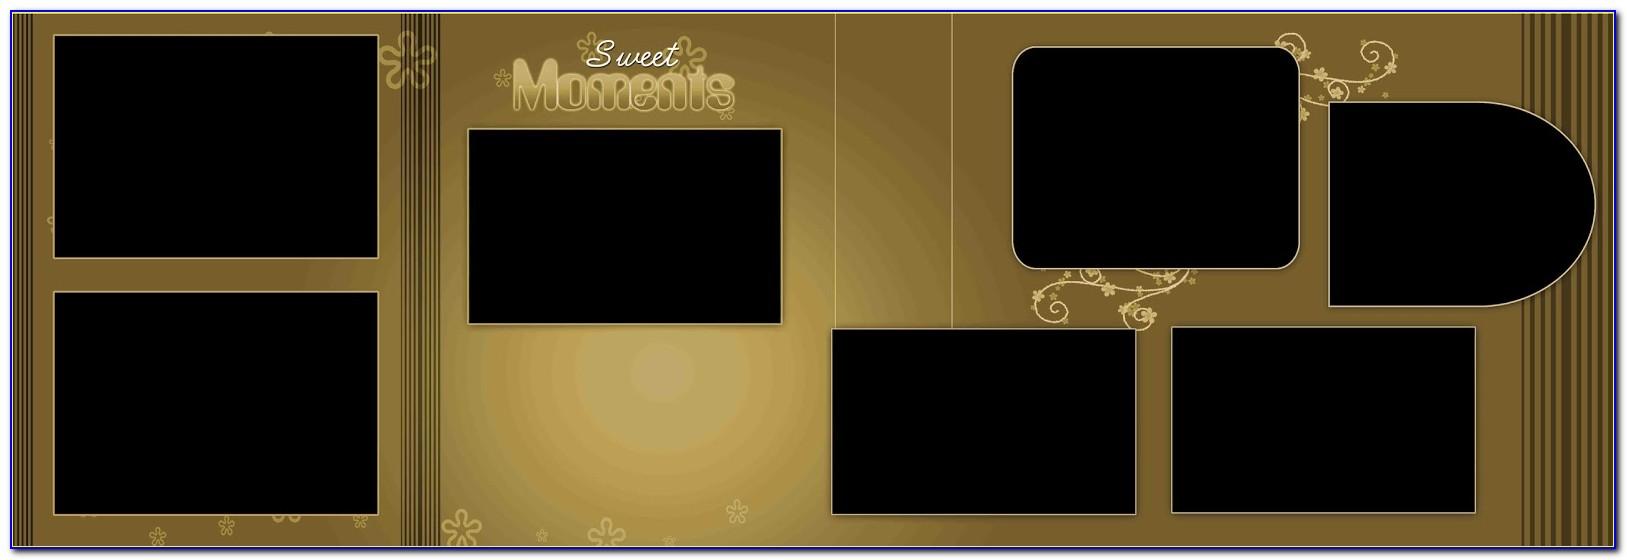 Best Wedding Album Design 12x36 Psd Templates